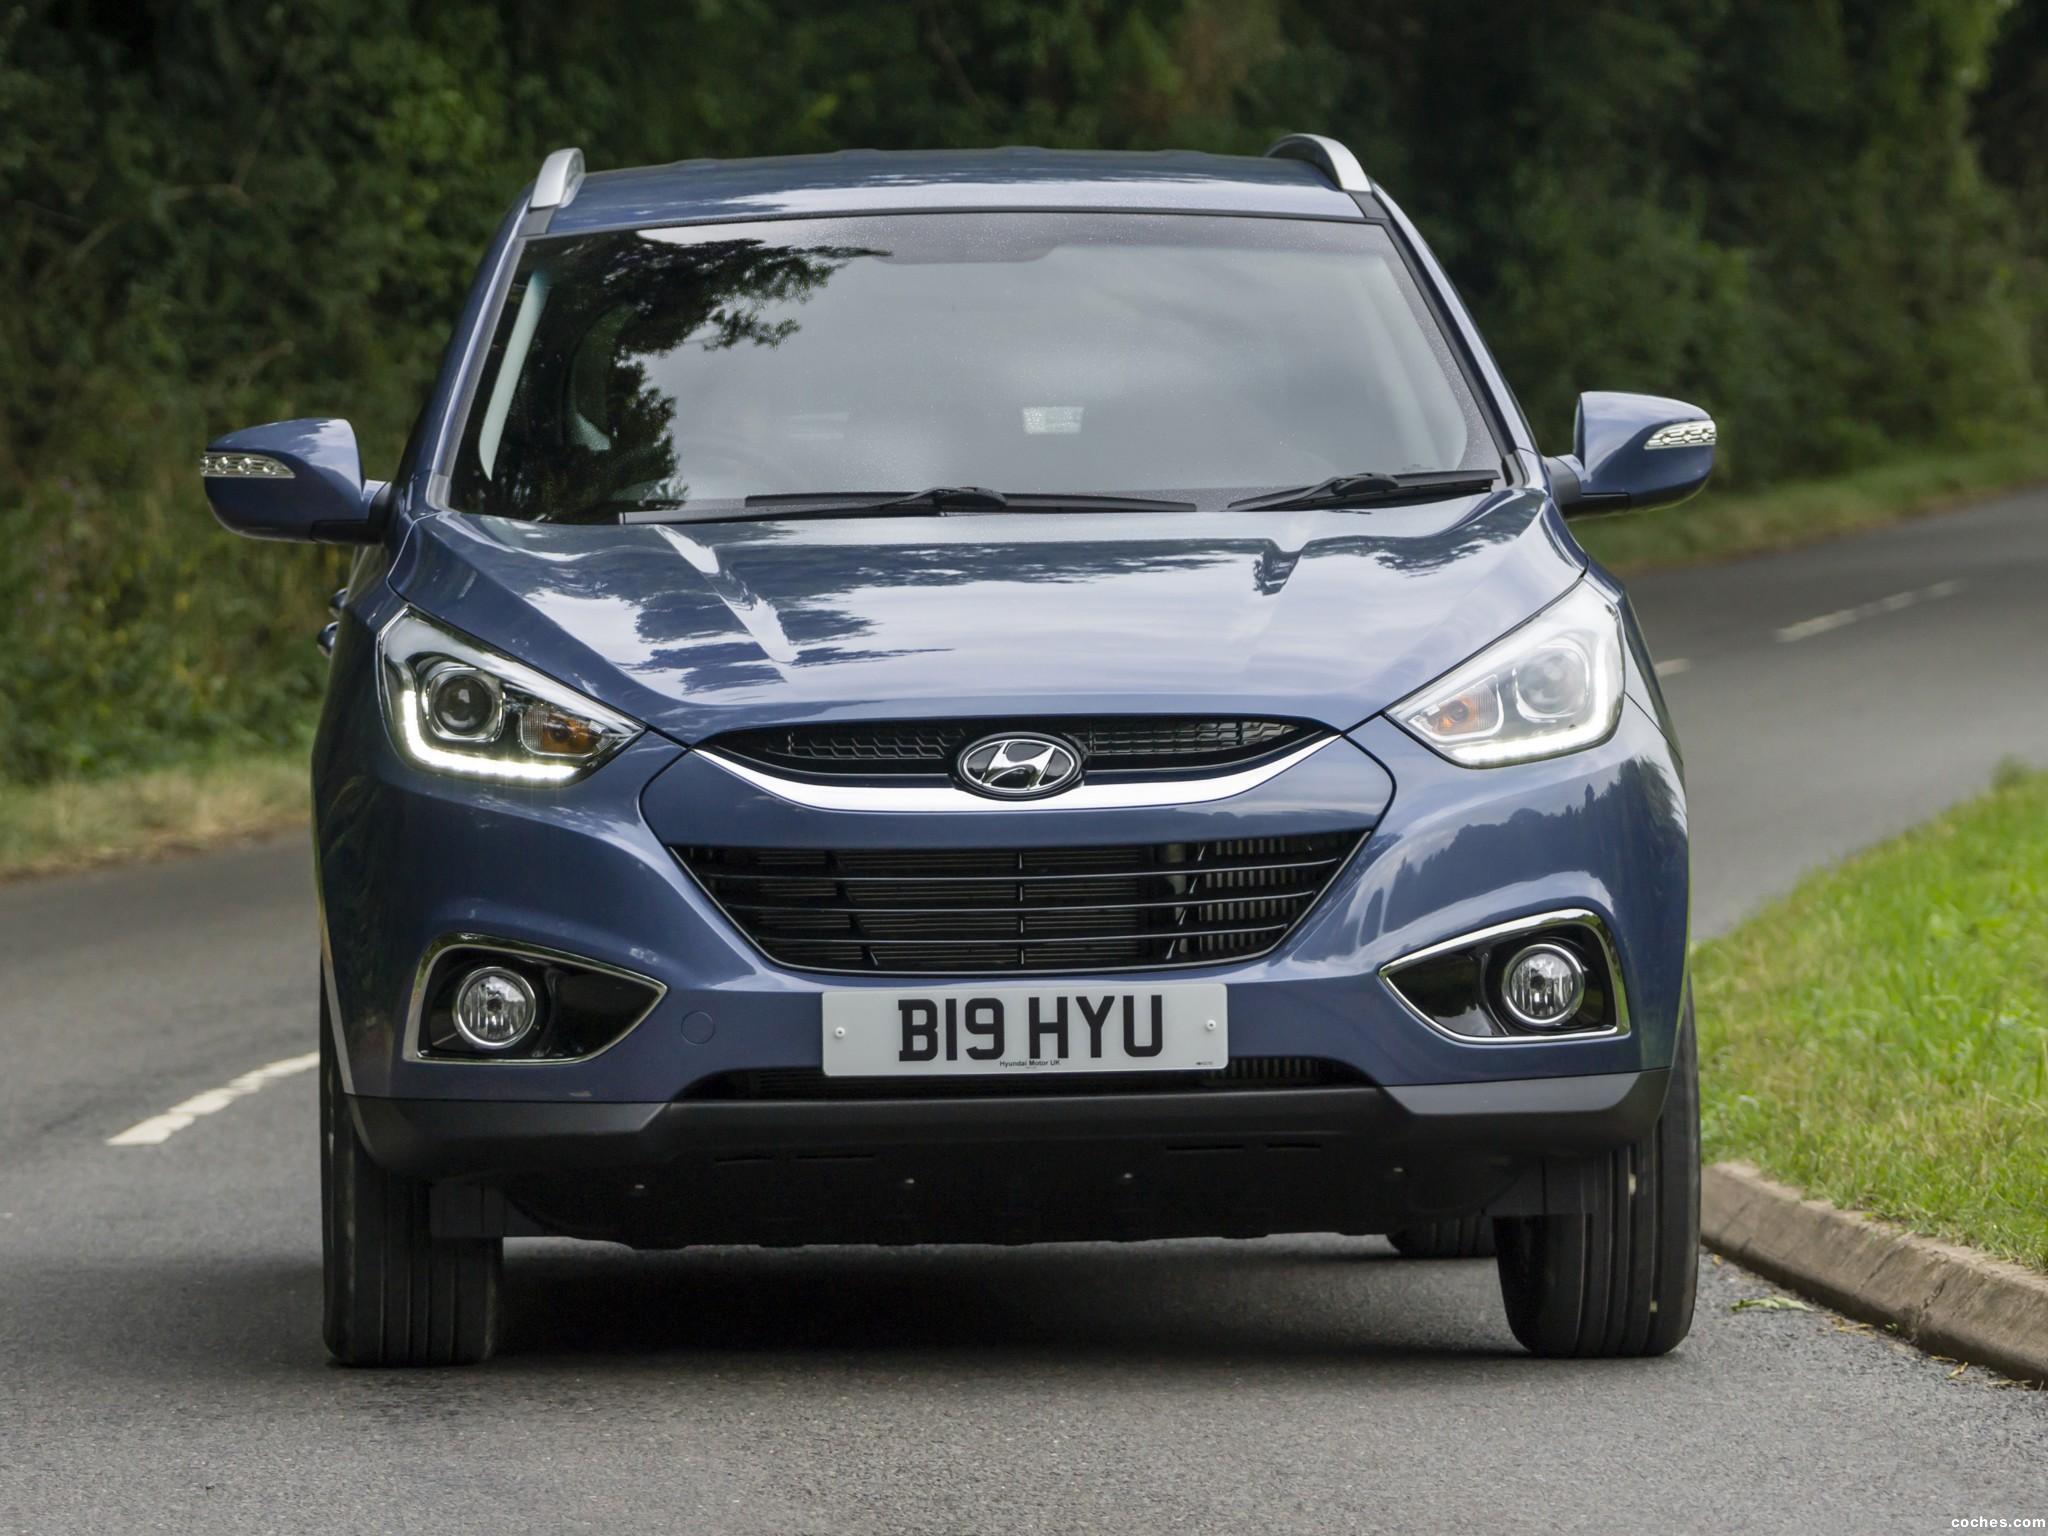 Foto 0 de Hyundai ix35 UK 2013